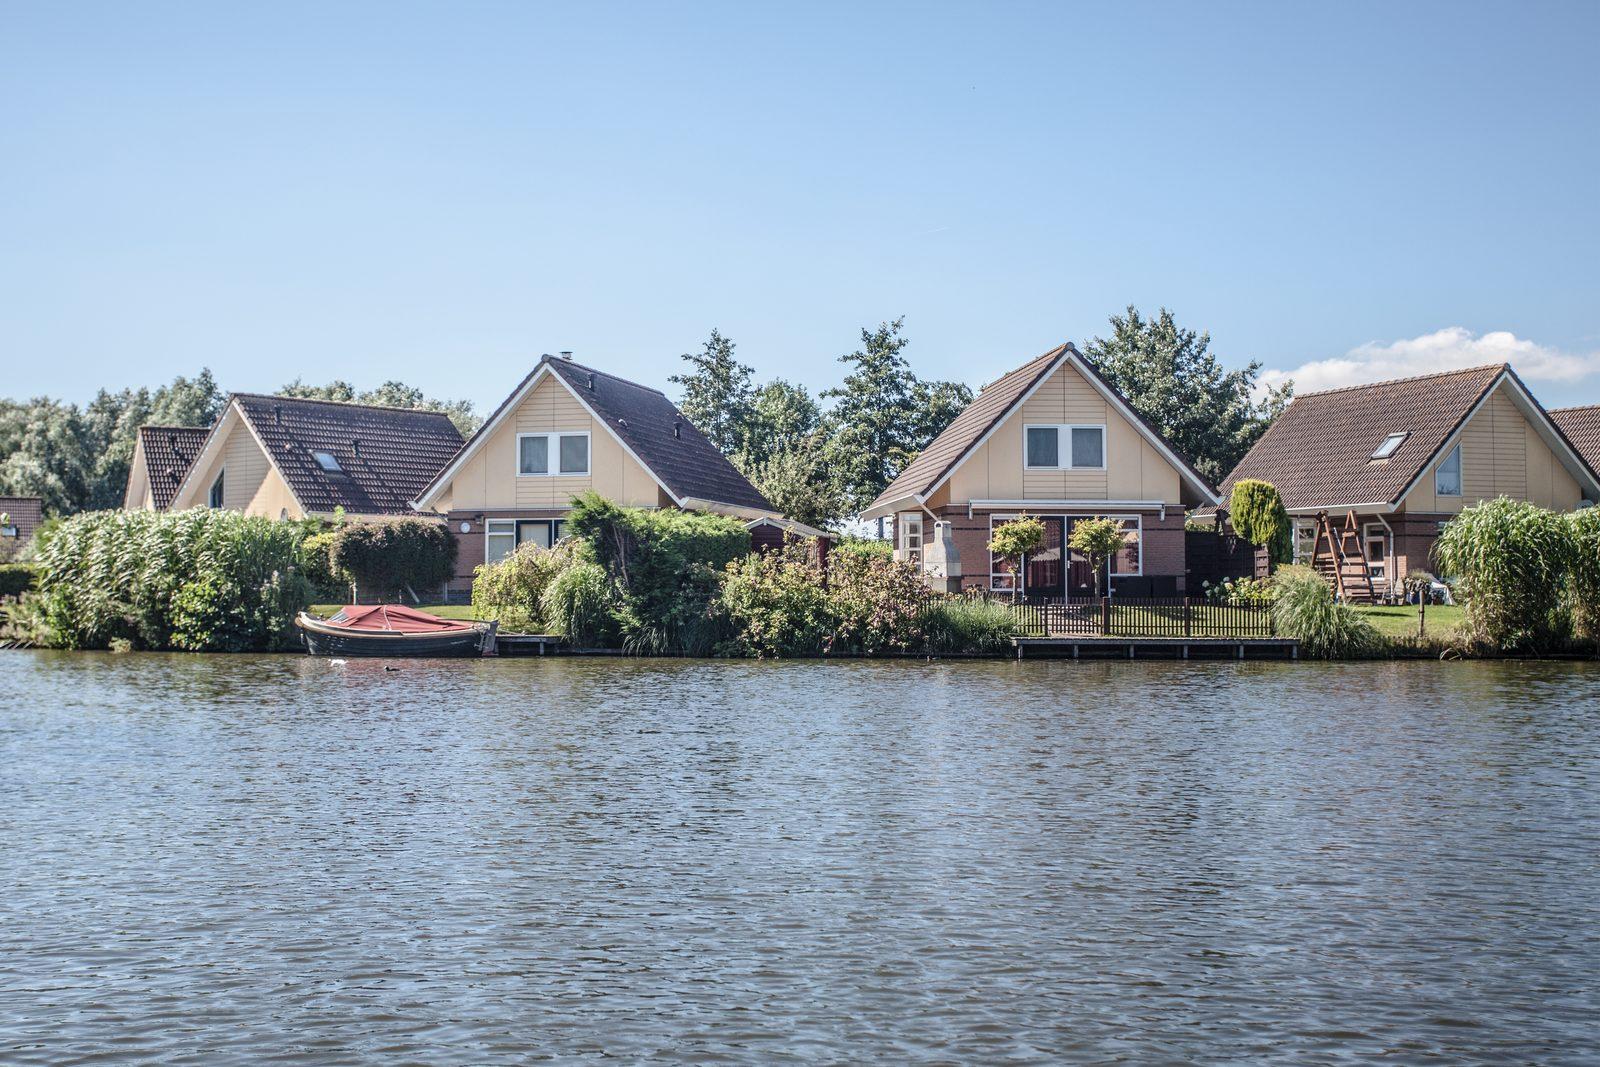 Meivakantie Noord-Holland